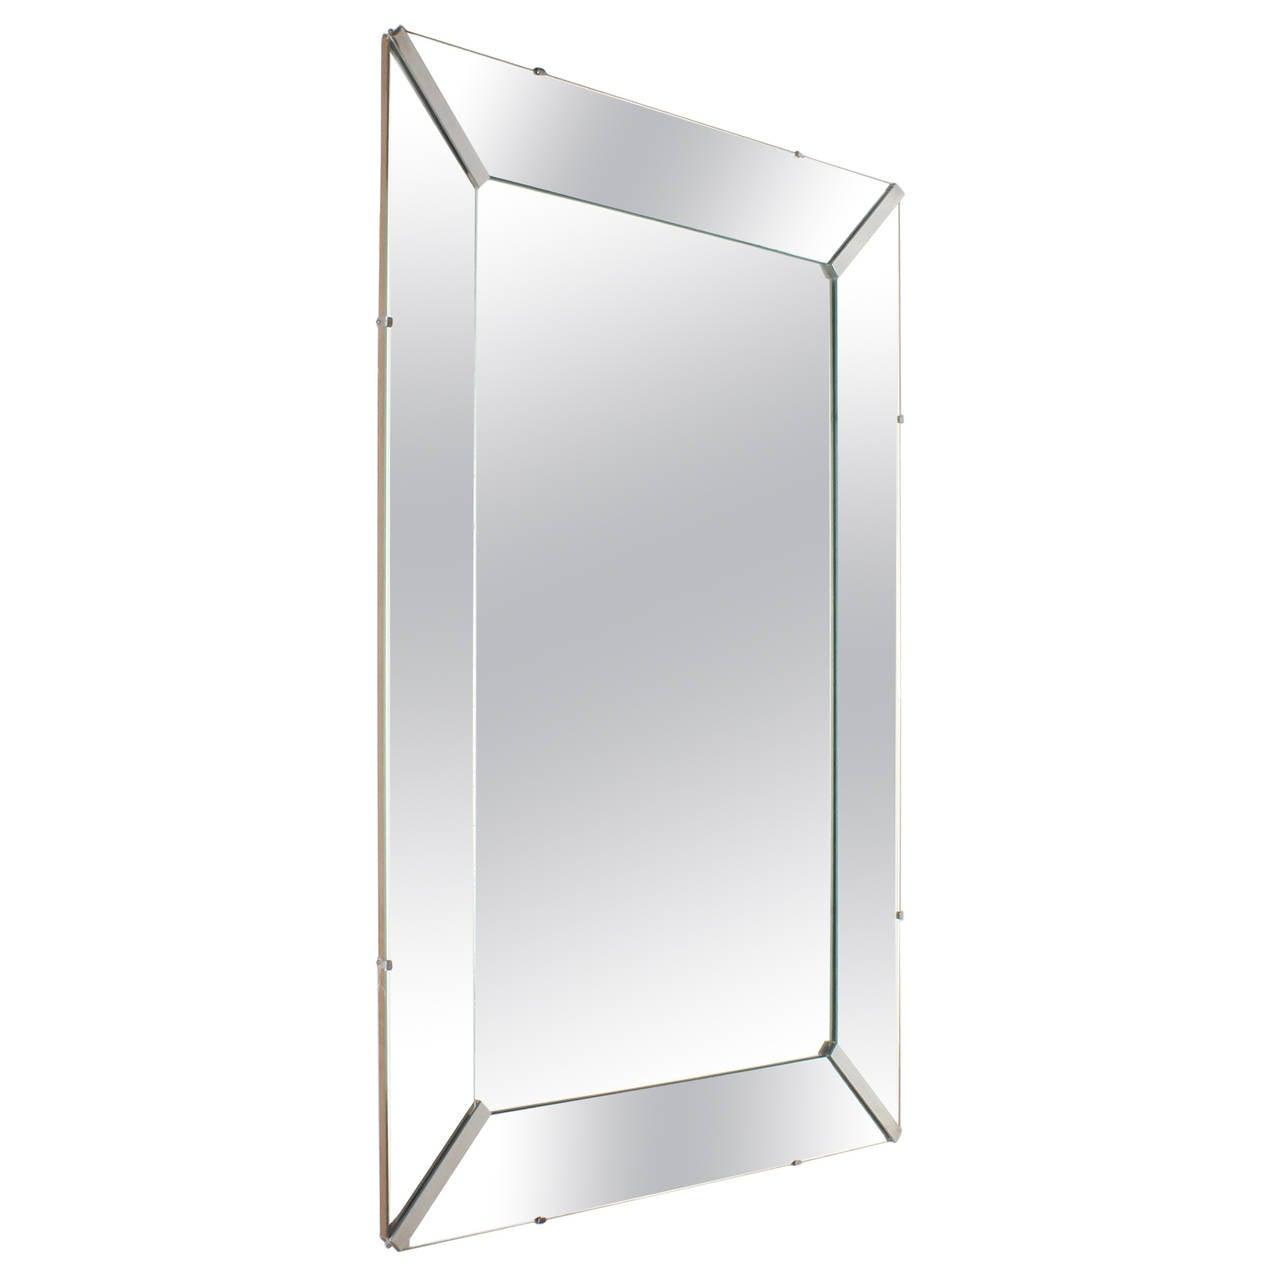 Straight Edge Mirrored Frame Mirror, circa 1940 at 1stdibs